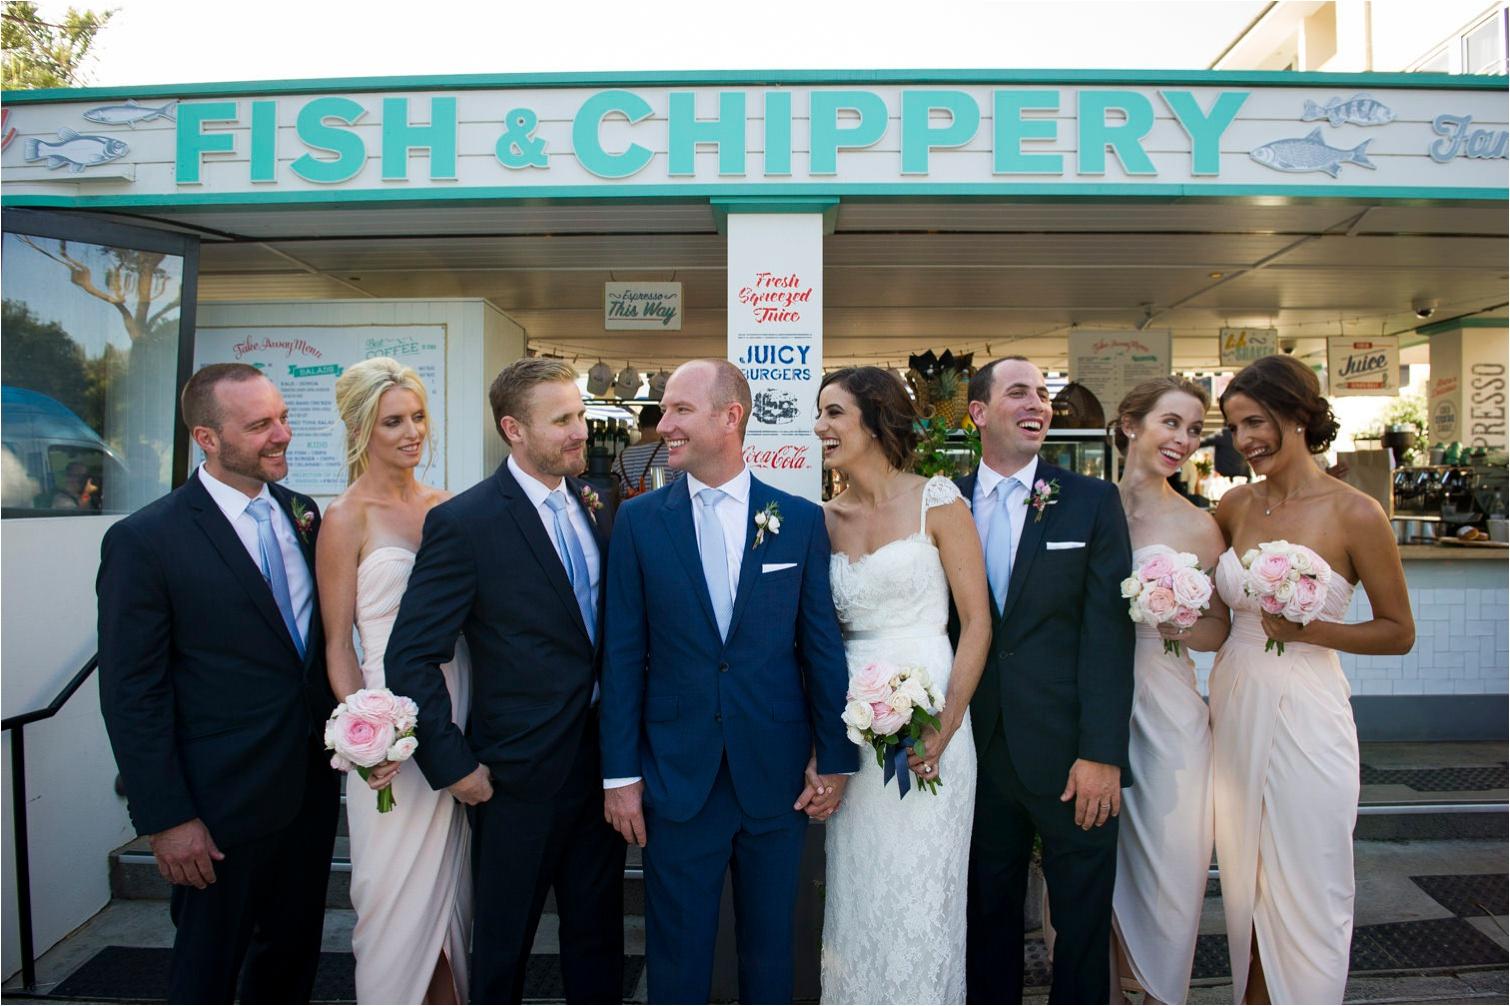 Nicole&Carlie_Watsons_Bay_Hotel_Wedding_by_Gold_Coast_Photographers-The_Follans45.jpg